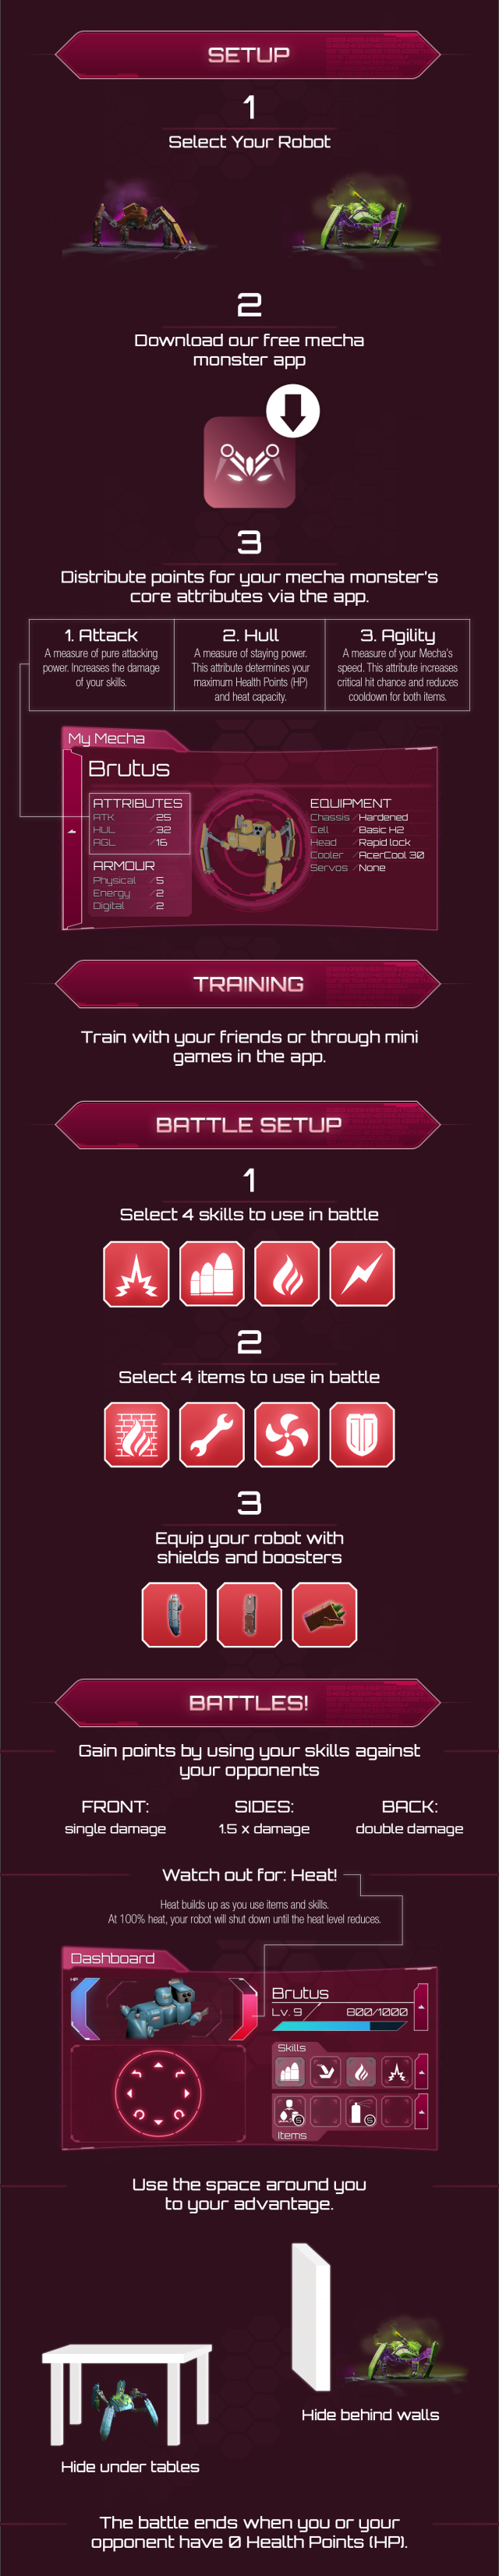 Screenshot - Mecha Monsters (Android)